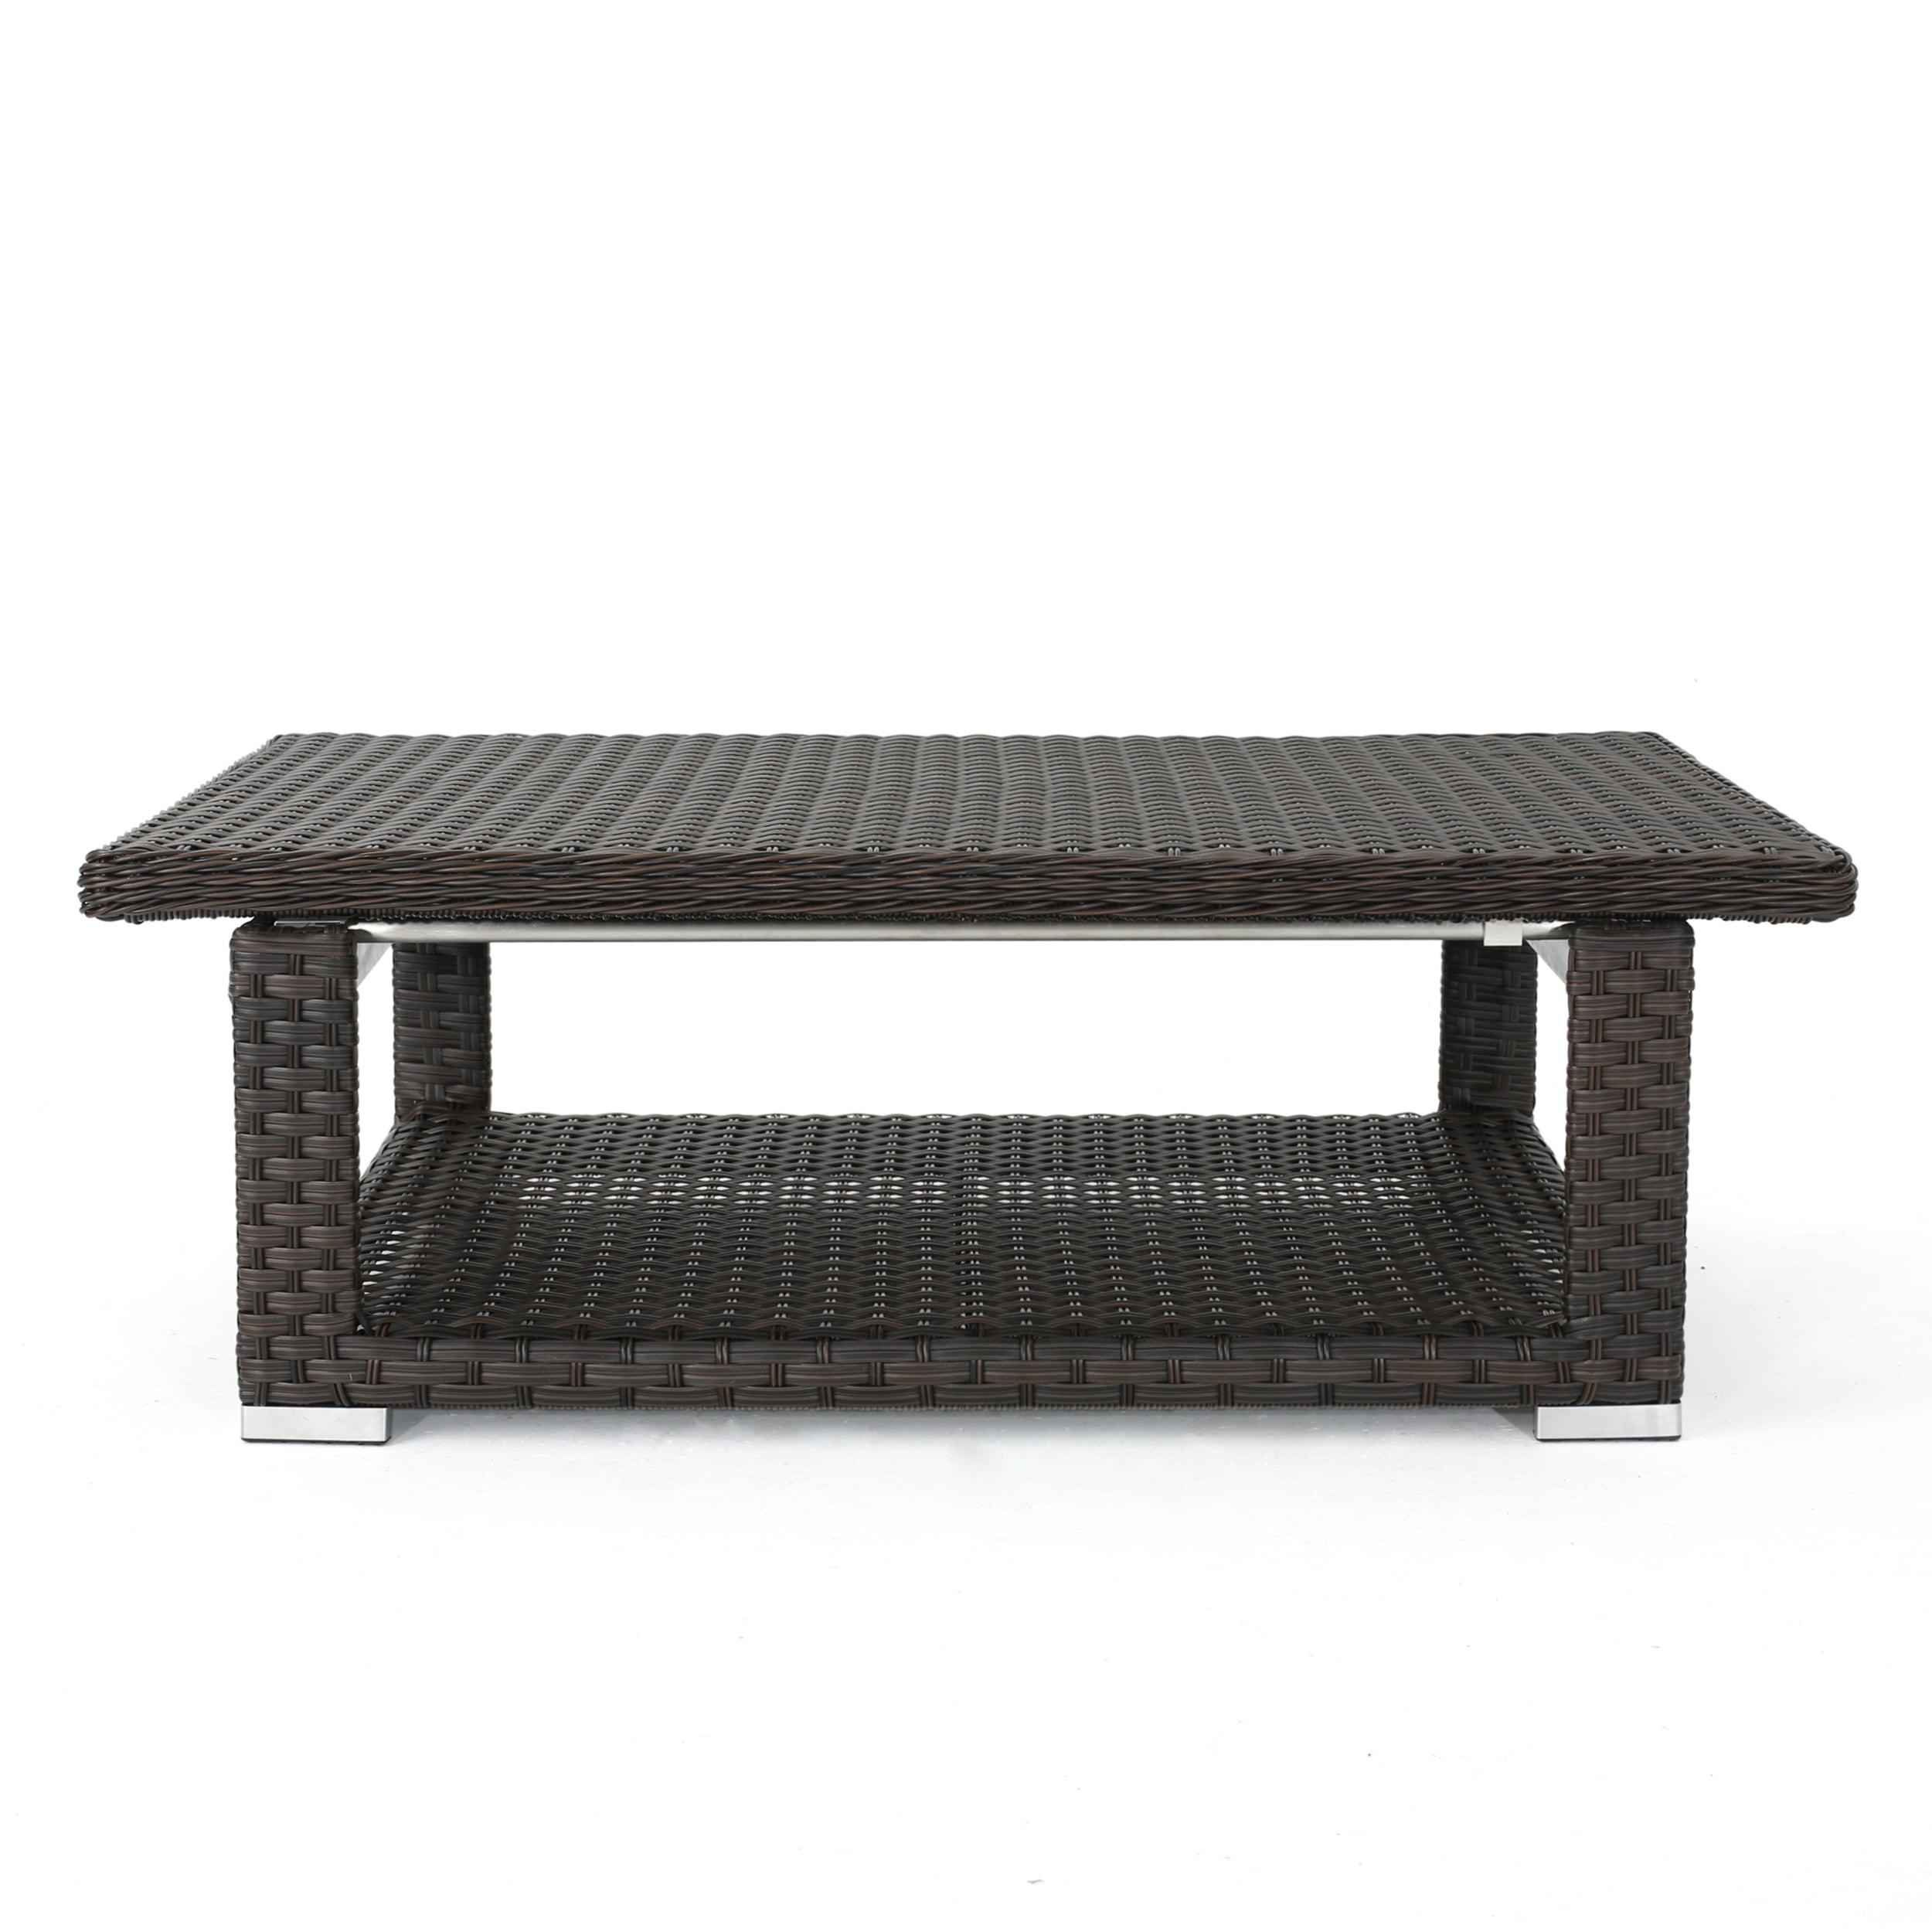 Lanie Outdoor Adjustable Wicker Aluminum Framed Coffee Table, Multibrown by GDF Studio